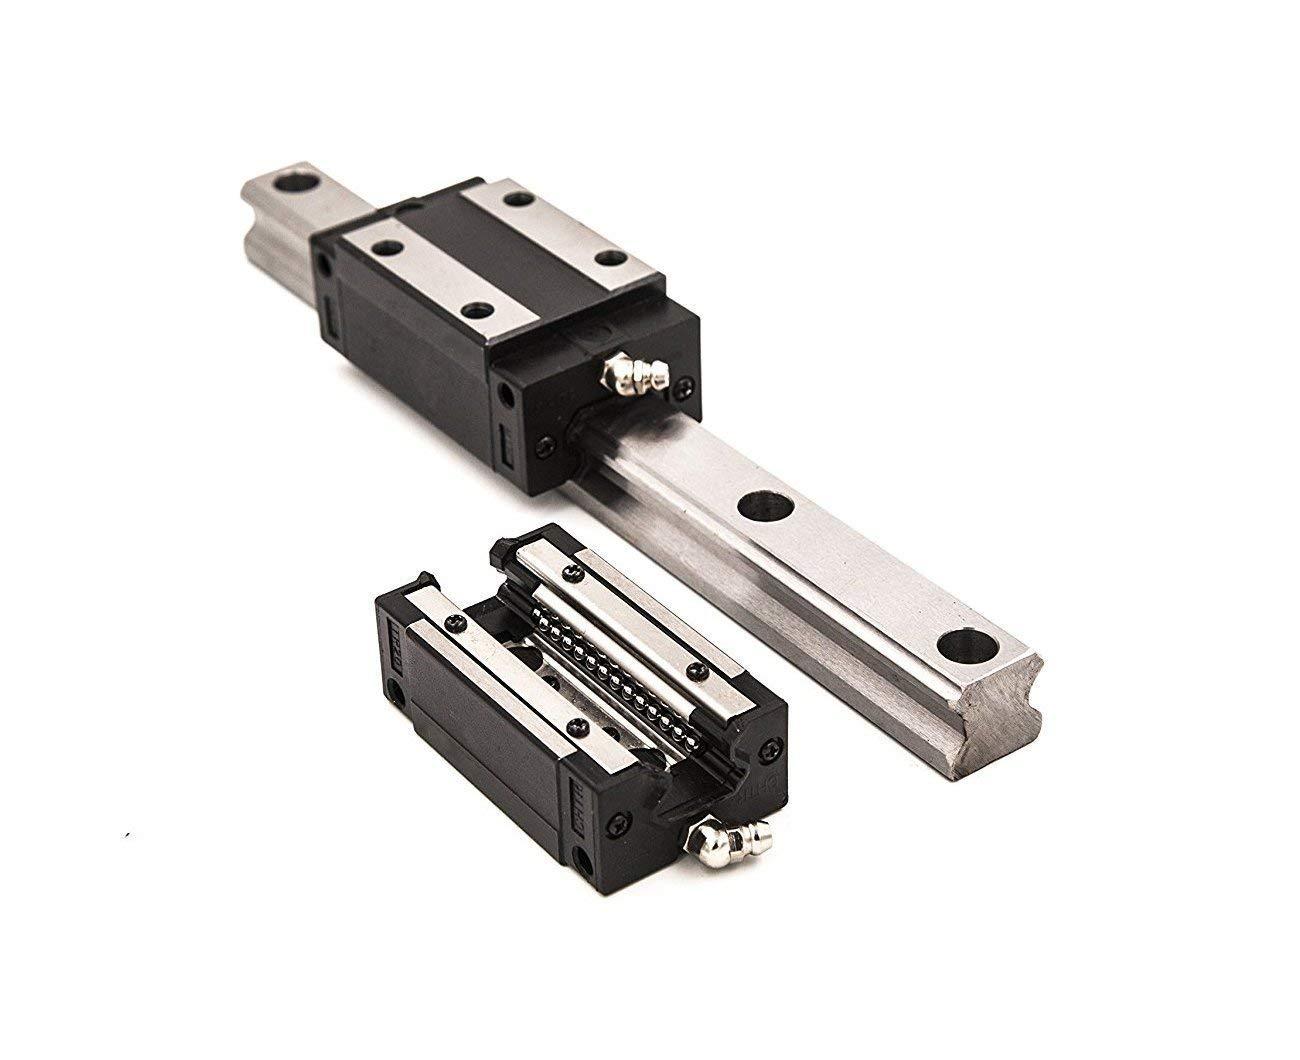 TEN-HIGH Linear Rail CNC Parts Linear Rail HSR35 1600mm Approx 62.99inch Linear Guideway Rail+2pcs HSR35CR Square Type Carriage Bearing Block